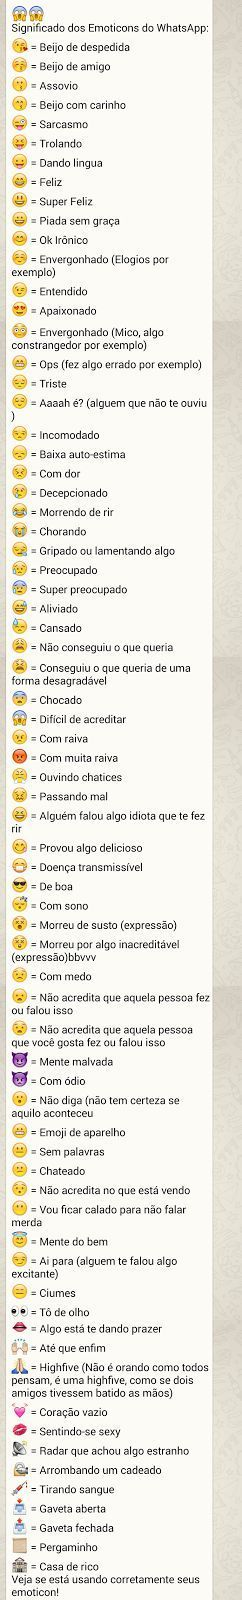 Significados Emoticons Whatsapp!! | Jabuti Rei: